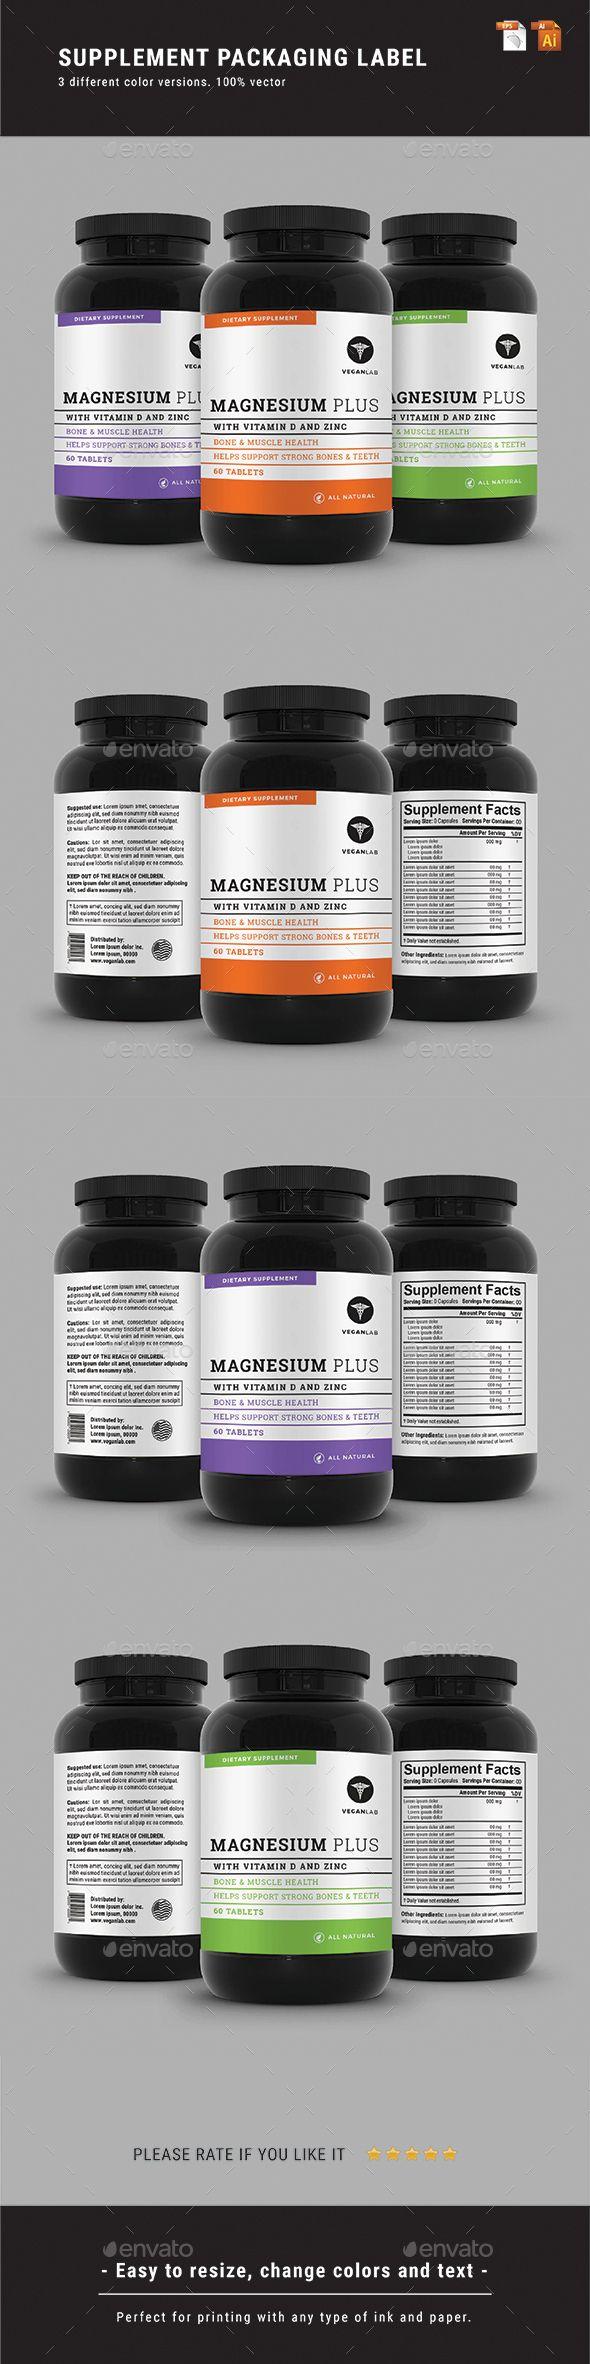 Supplement Packaging Label Design Template Vector EPS, AI Illustrator